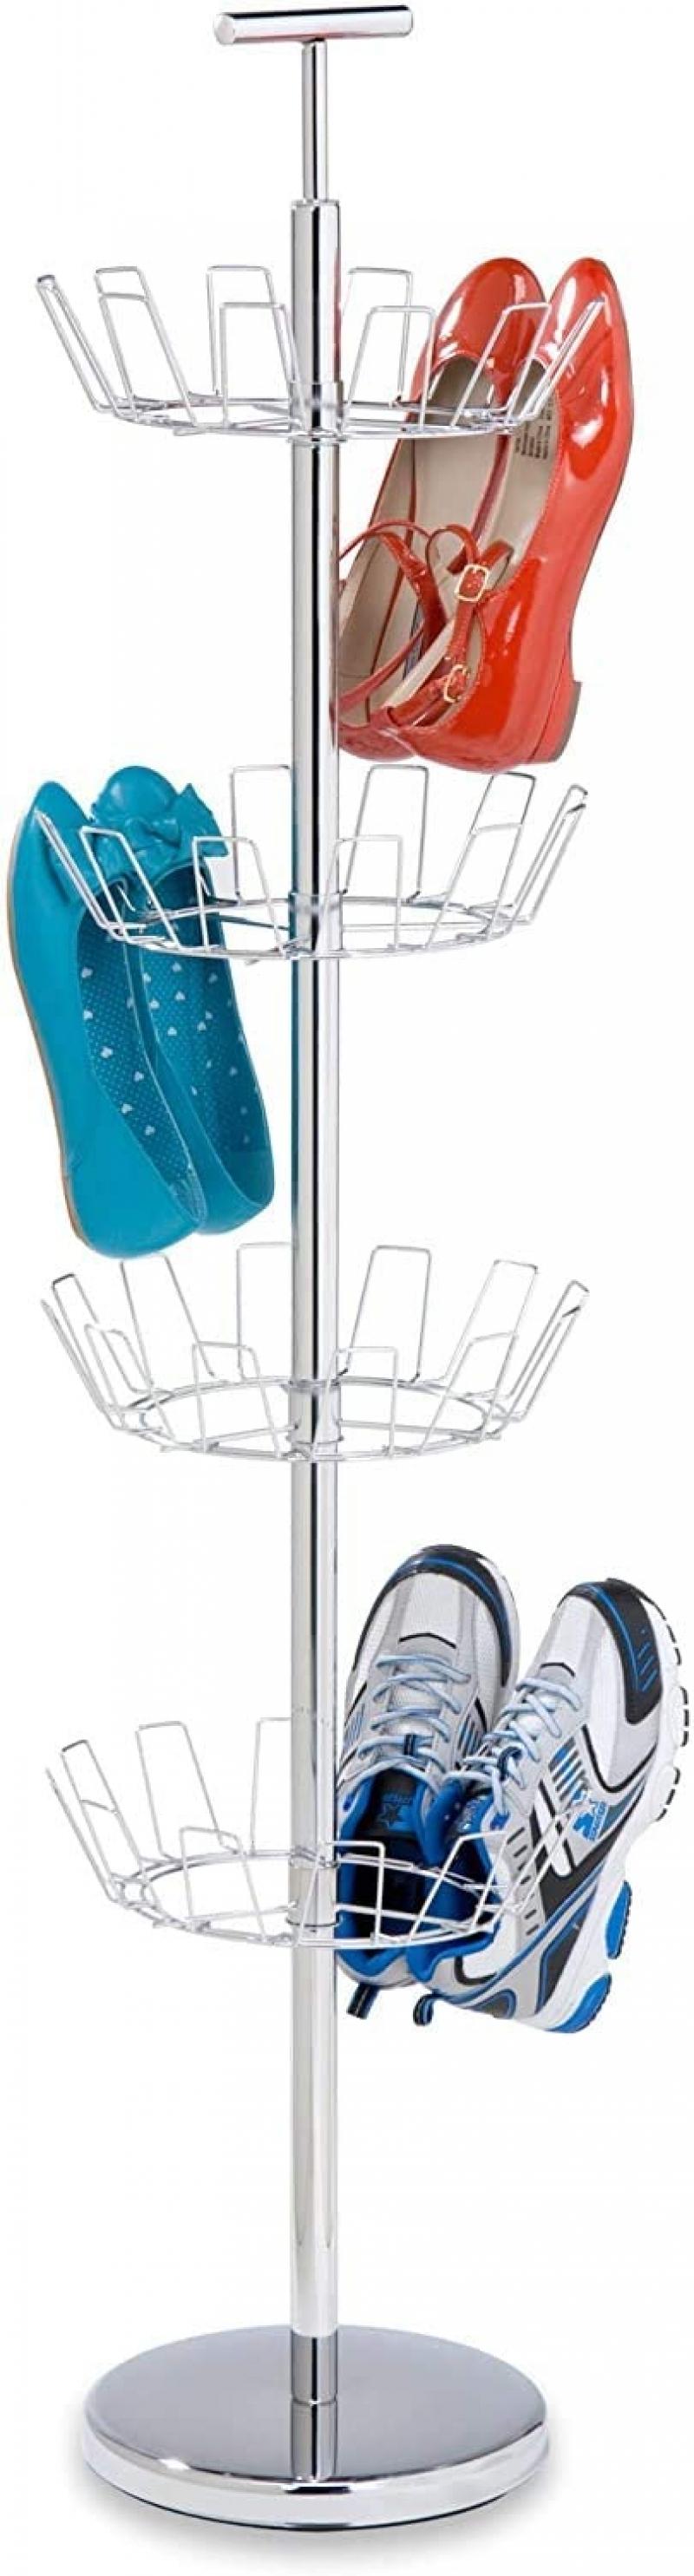 ihocon: Honey-Can-Do SHO-01483 Shoe Tree with Spinning Handle, Chrome, 4-Tier 四層旋轉鞋架